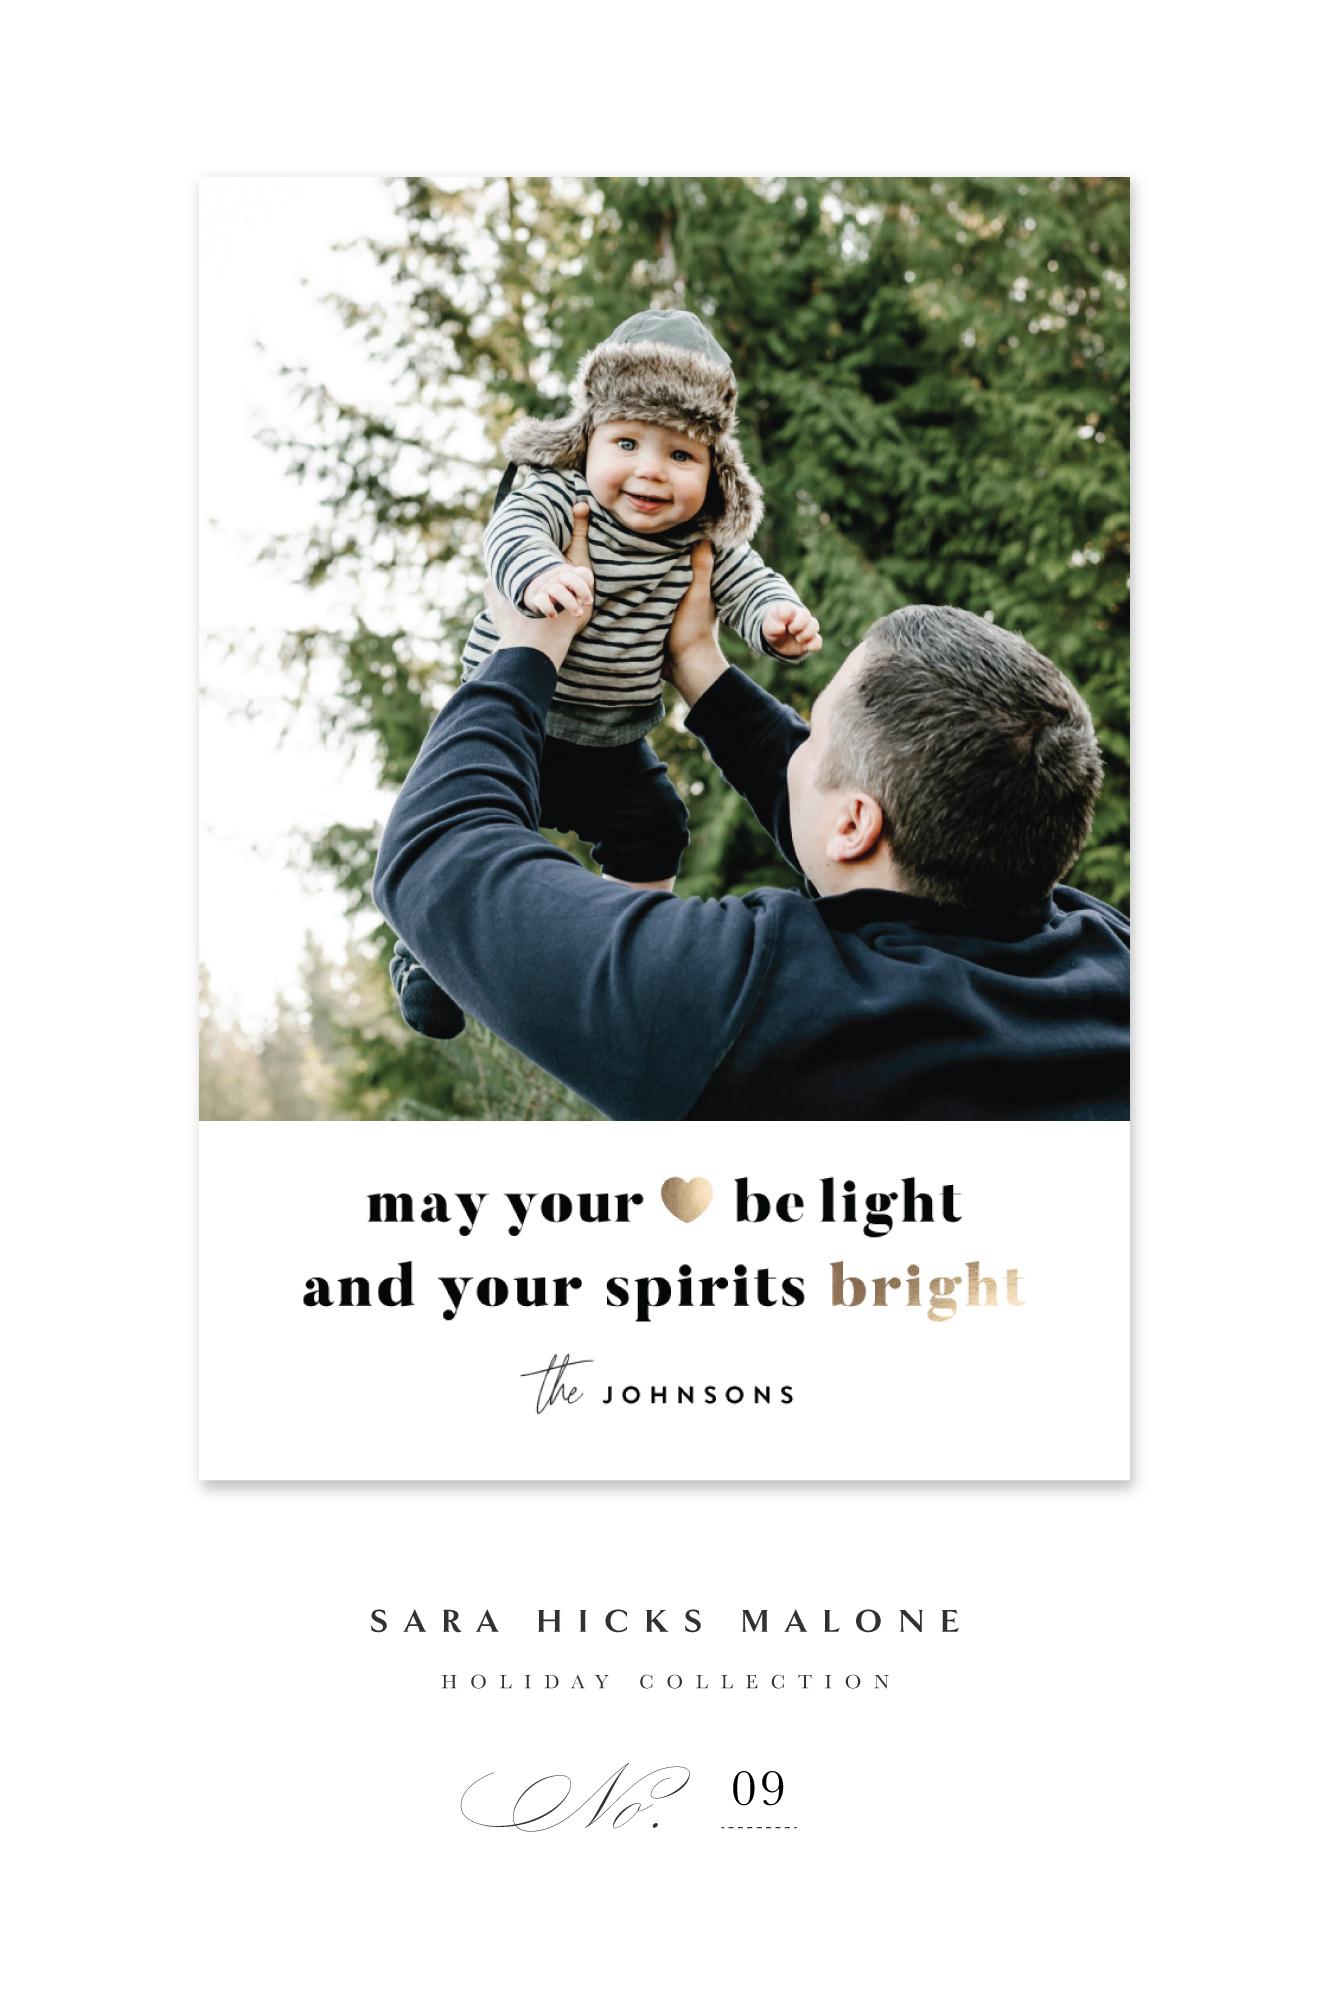 'light heart bright spirit' by Sara Hicks Malone